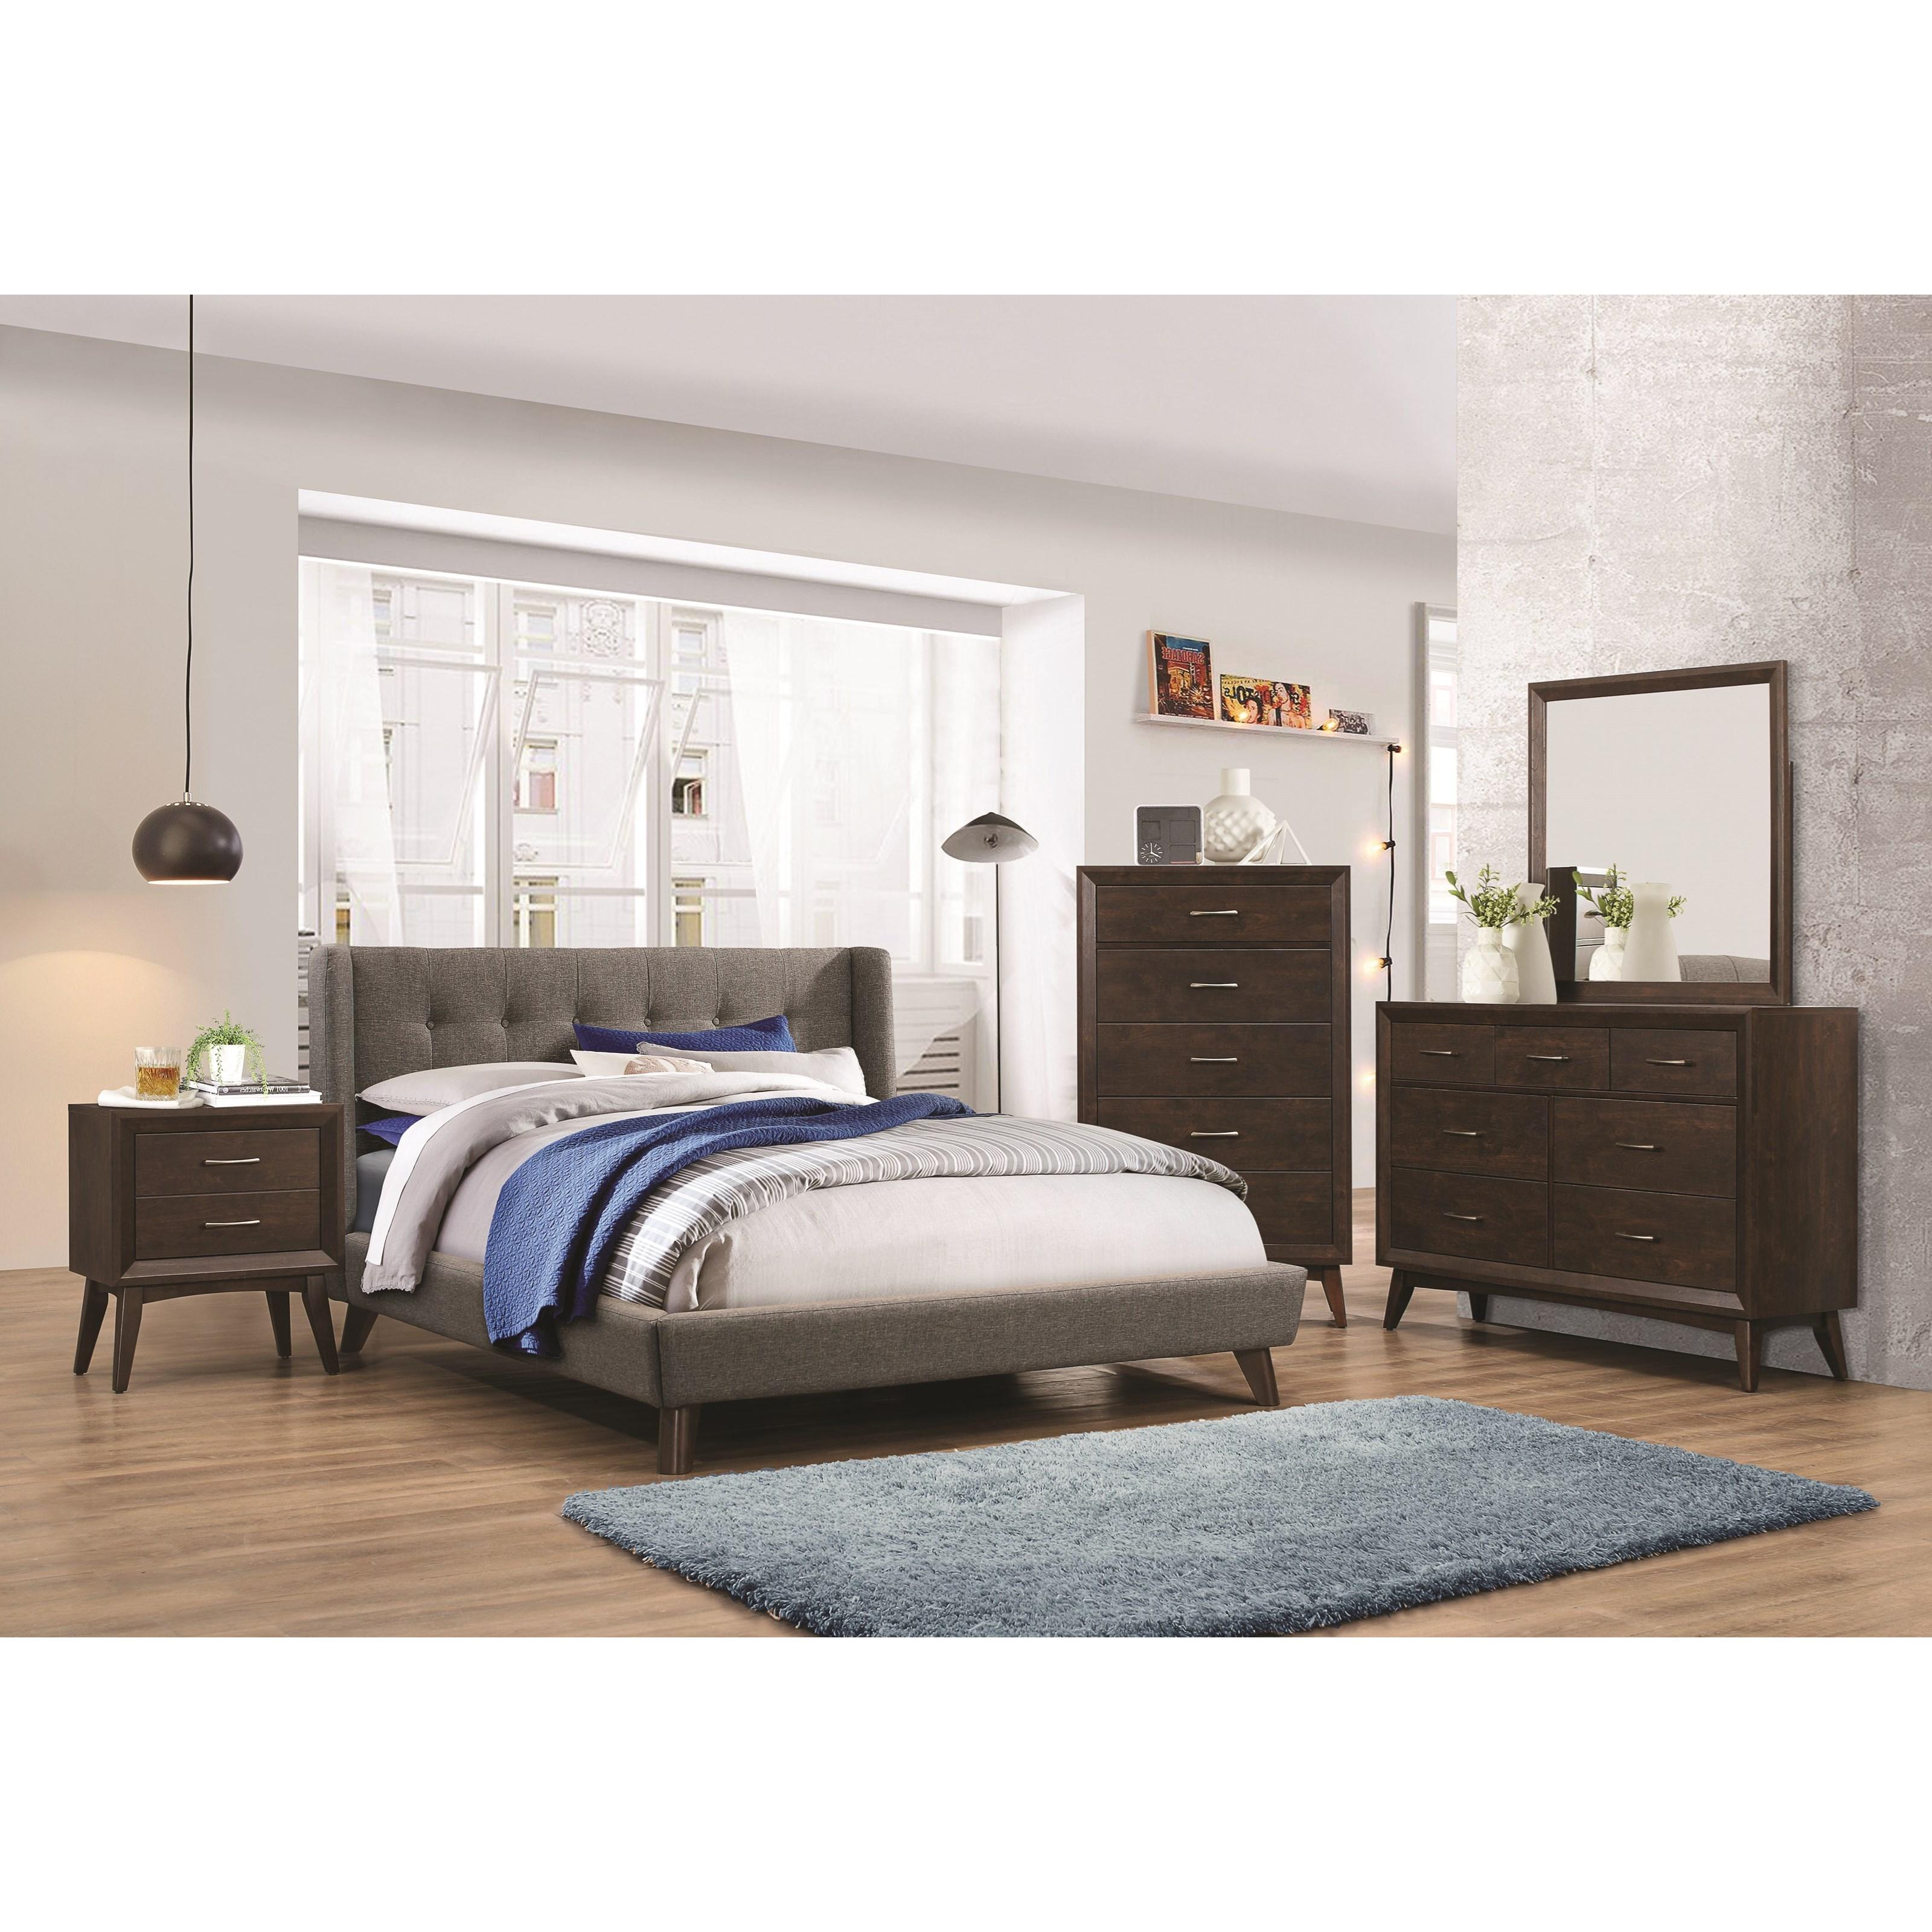 Coaster carrington queen bedroom group beck 39 s furniture for Bedroom groups